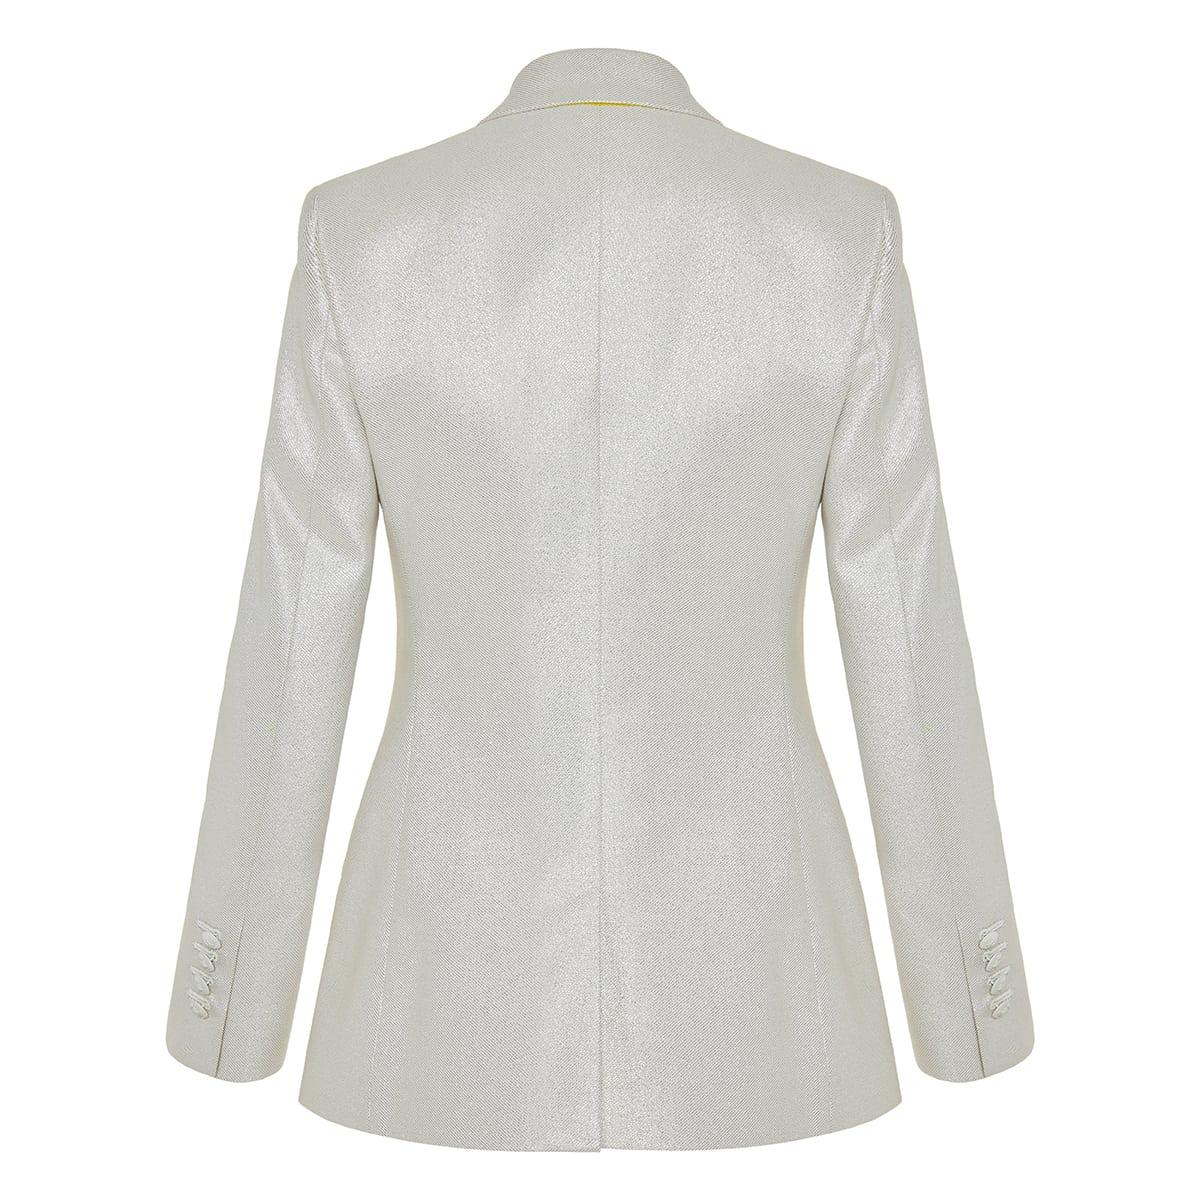 Single-breasted metallic blazer